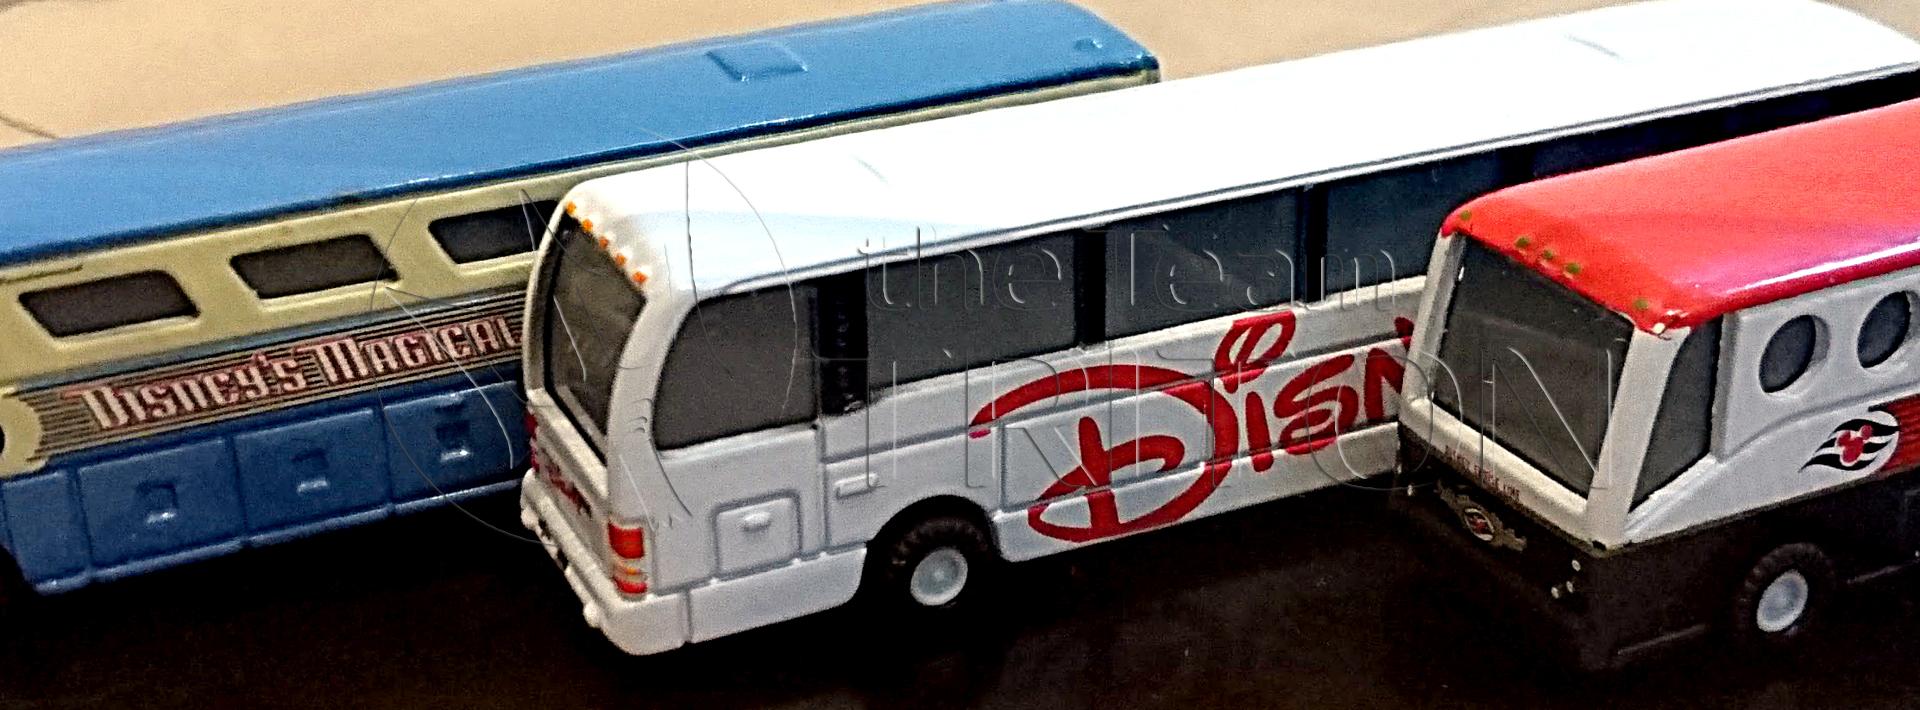 bus-models